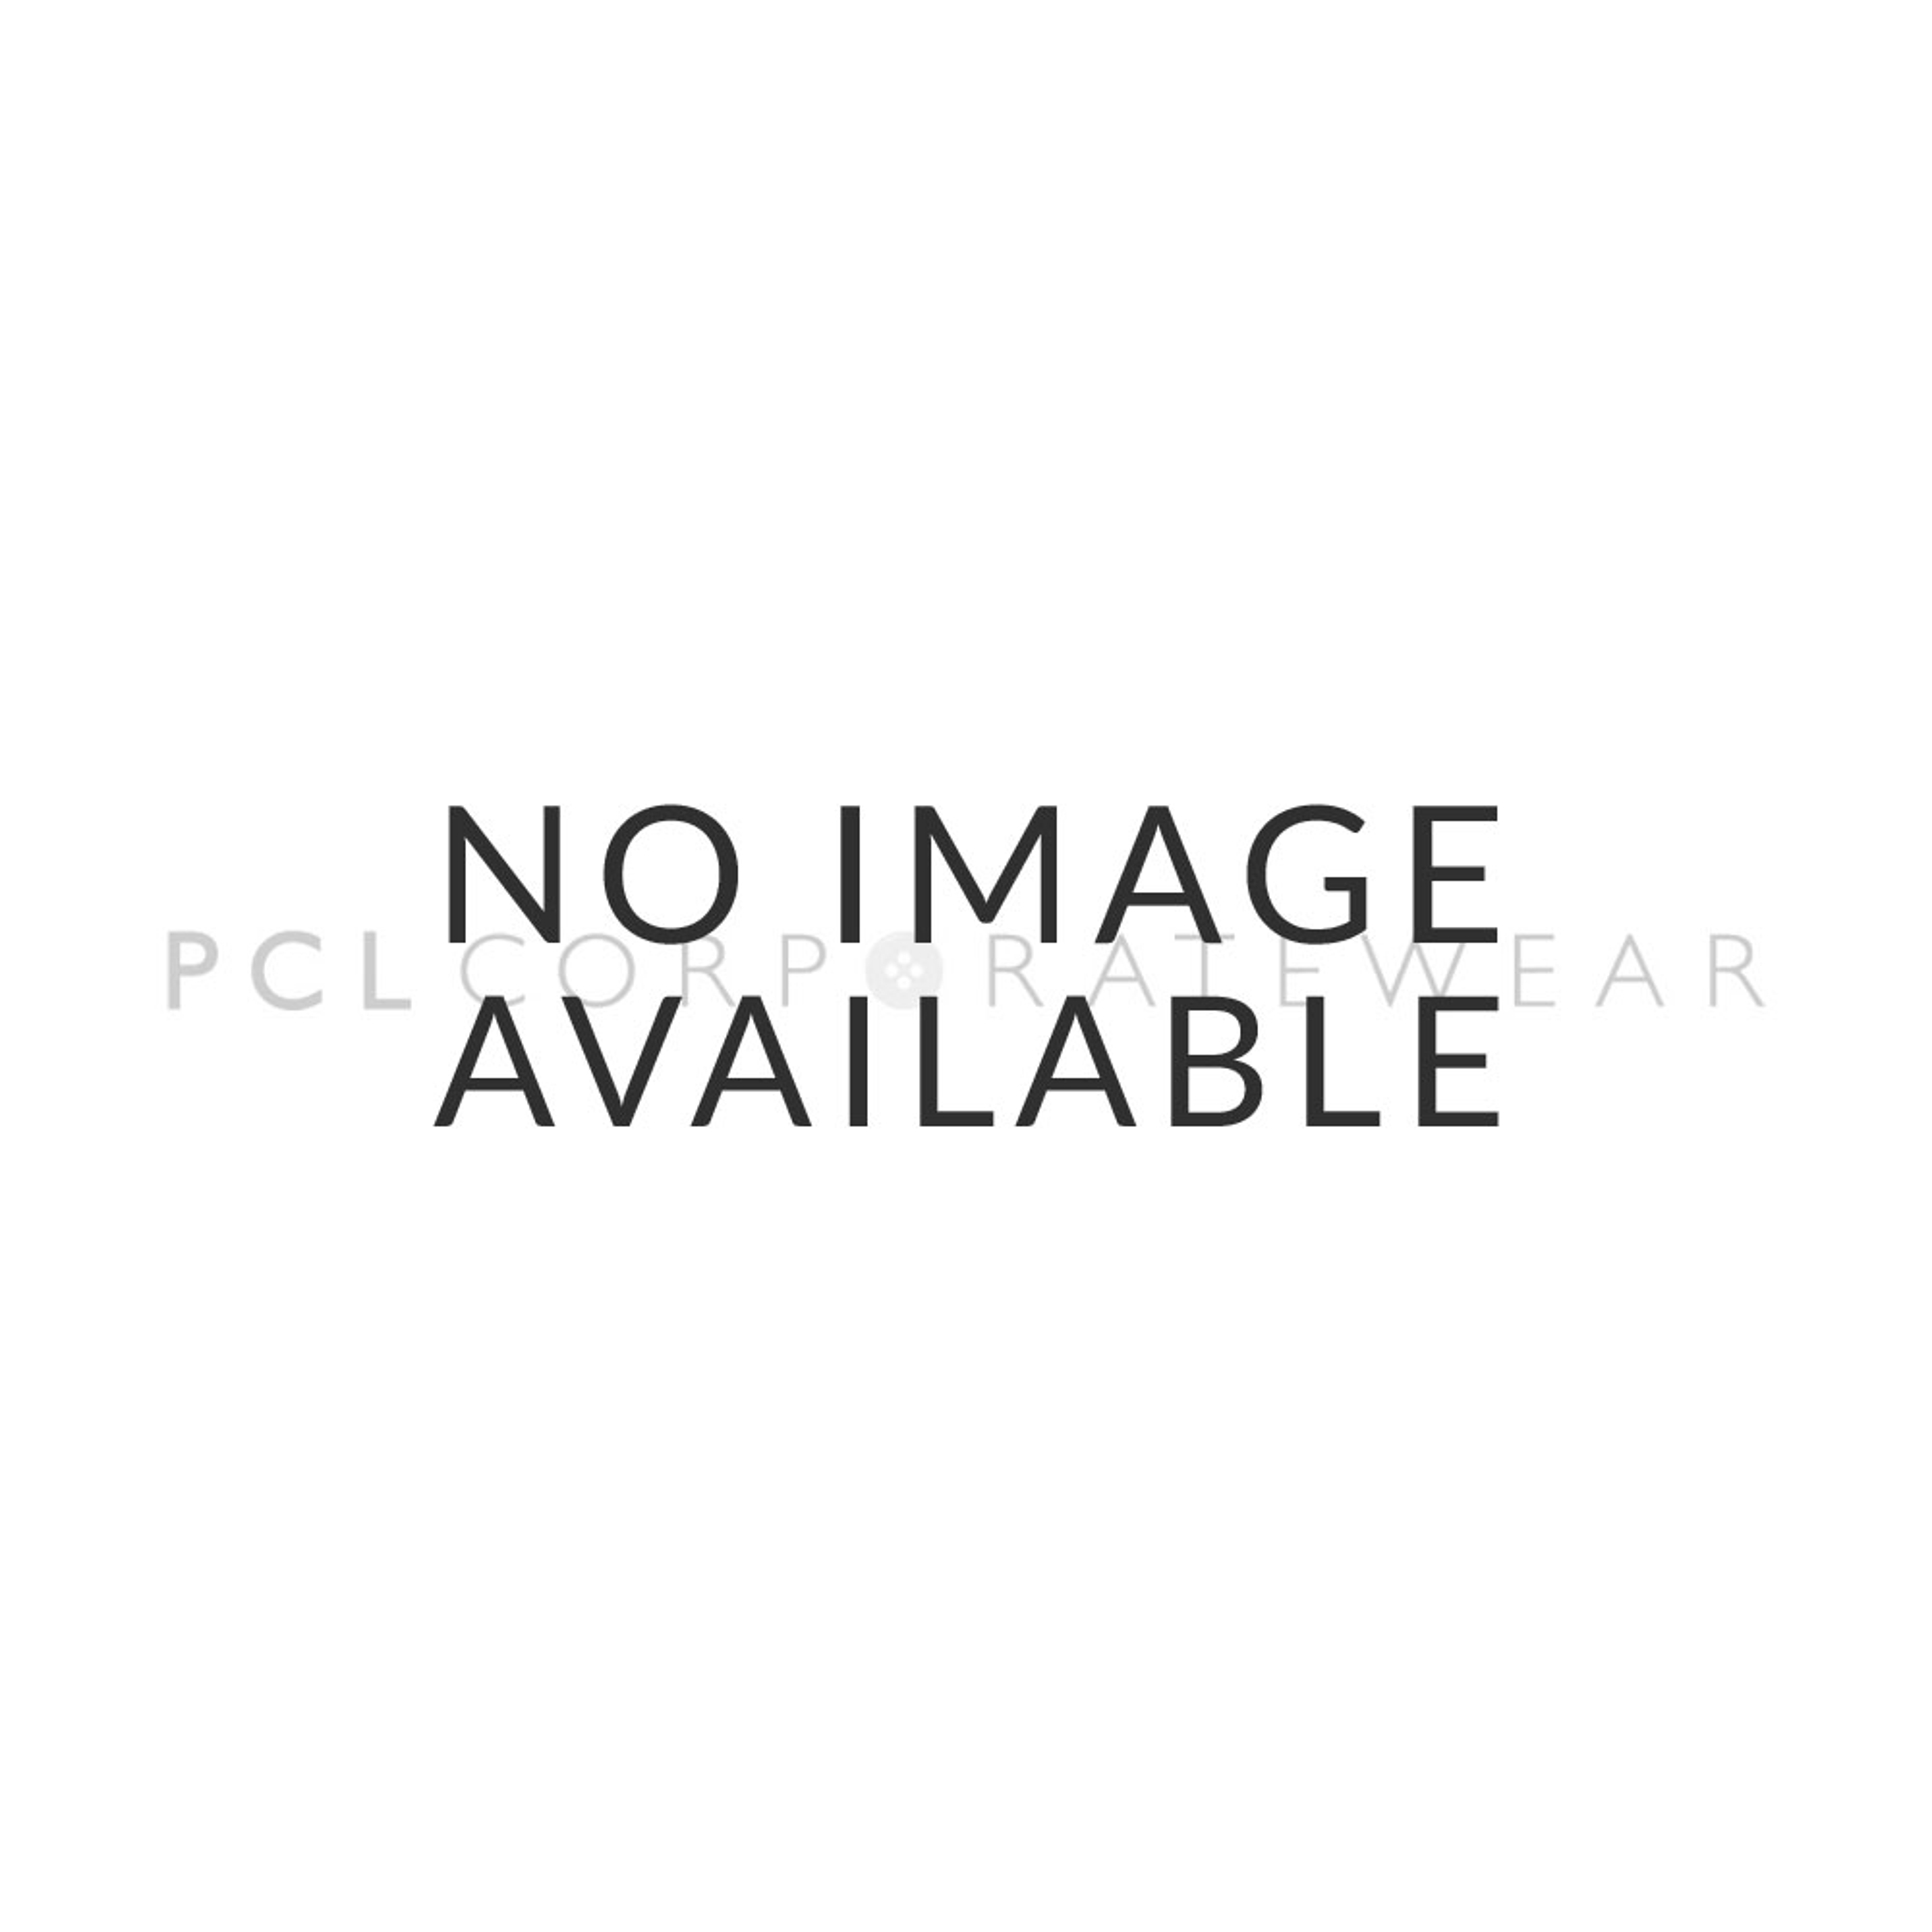 b9f30cf86ed8f Felina S S crepe de chine blouse - 2265 - PCL Corporatewear Ltd